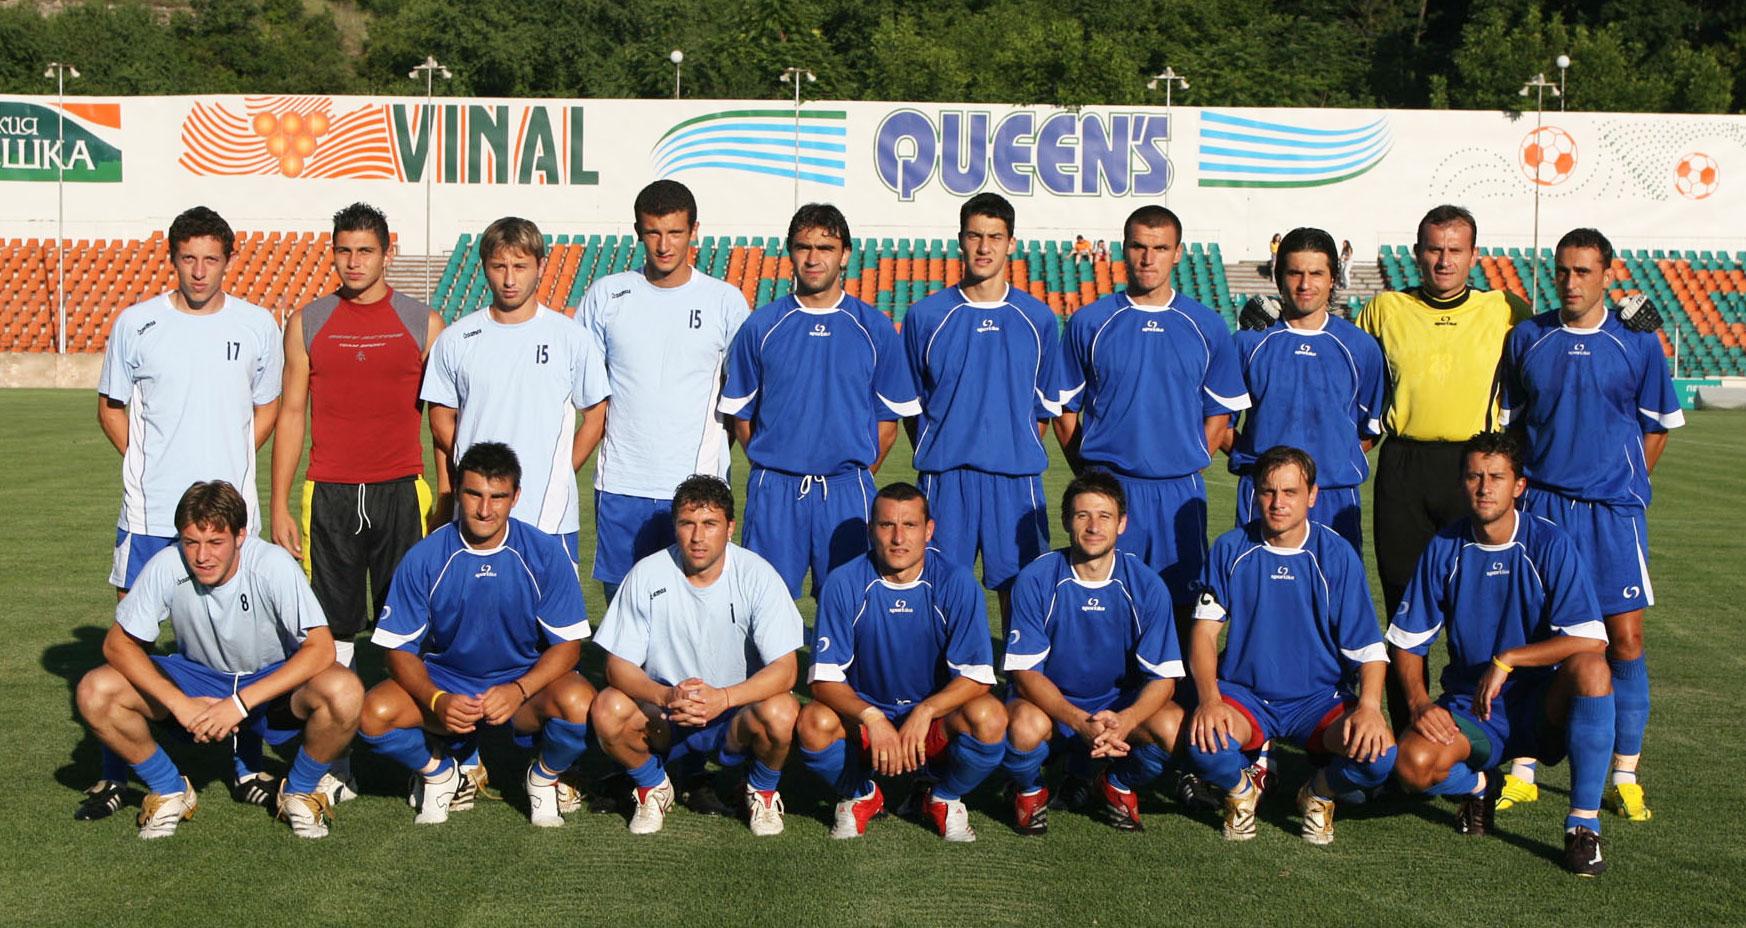 Дунав - сезон 2006/07